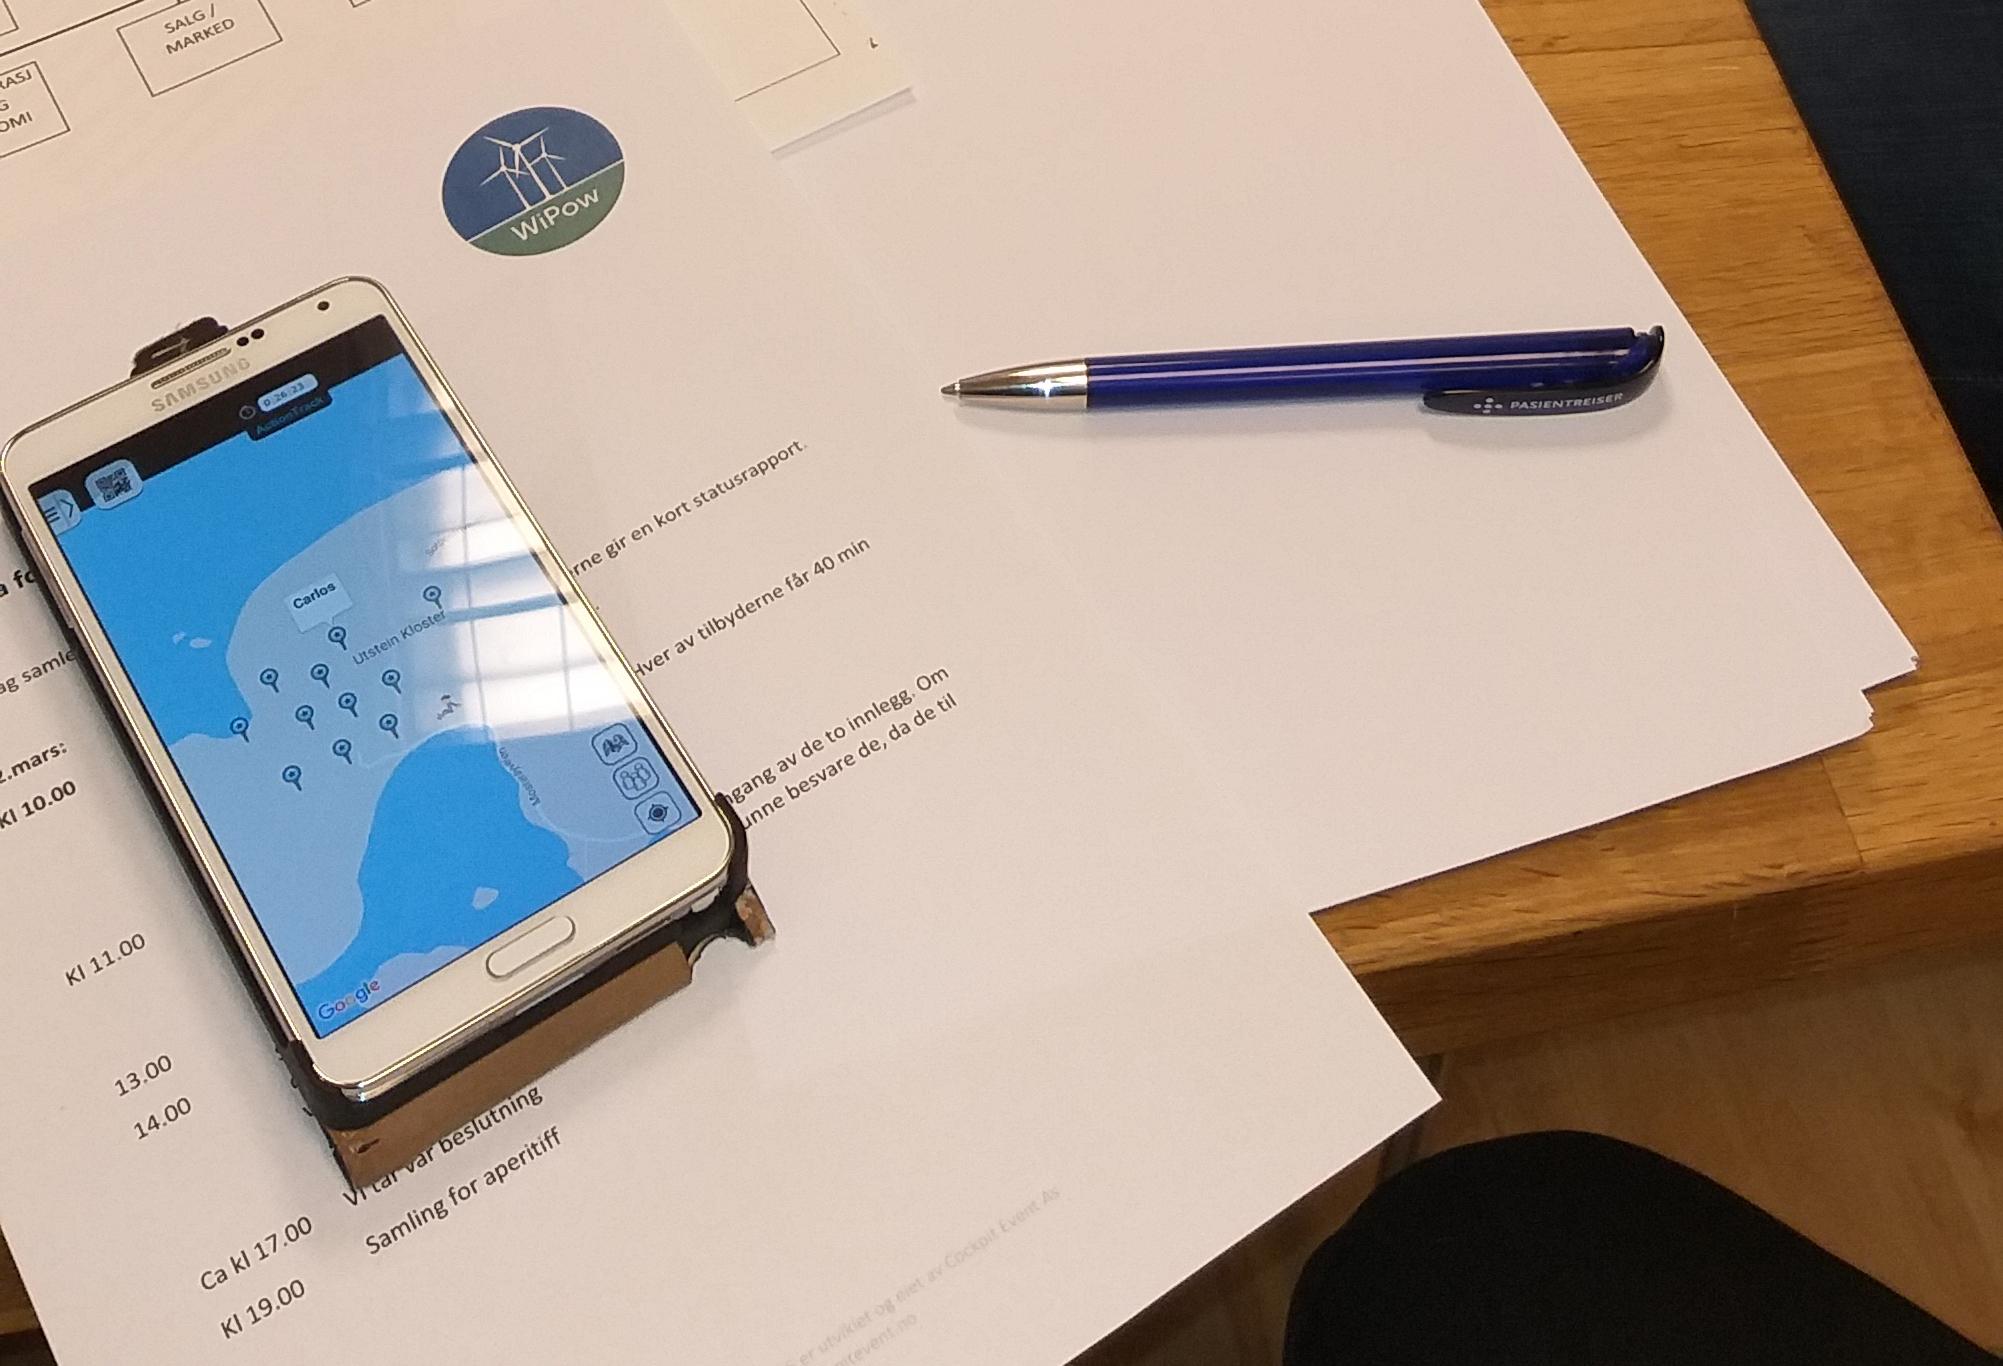 Telefon, penn og papir (WiPow)